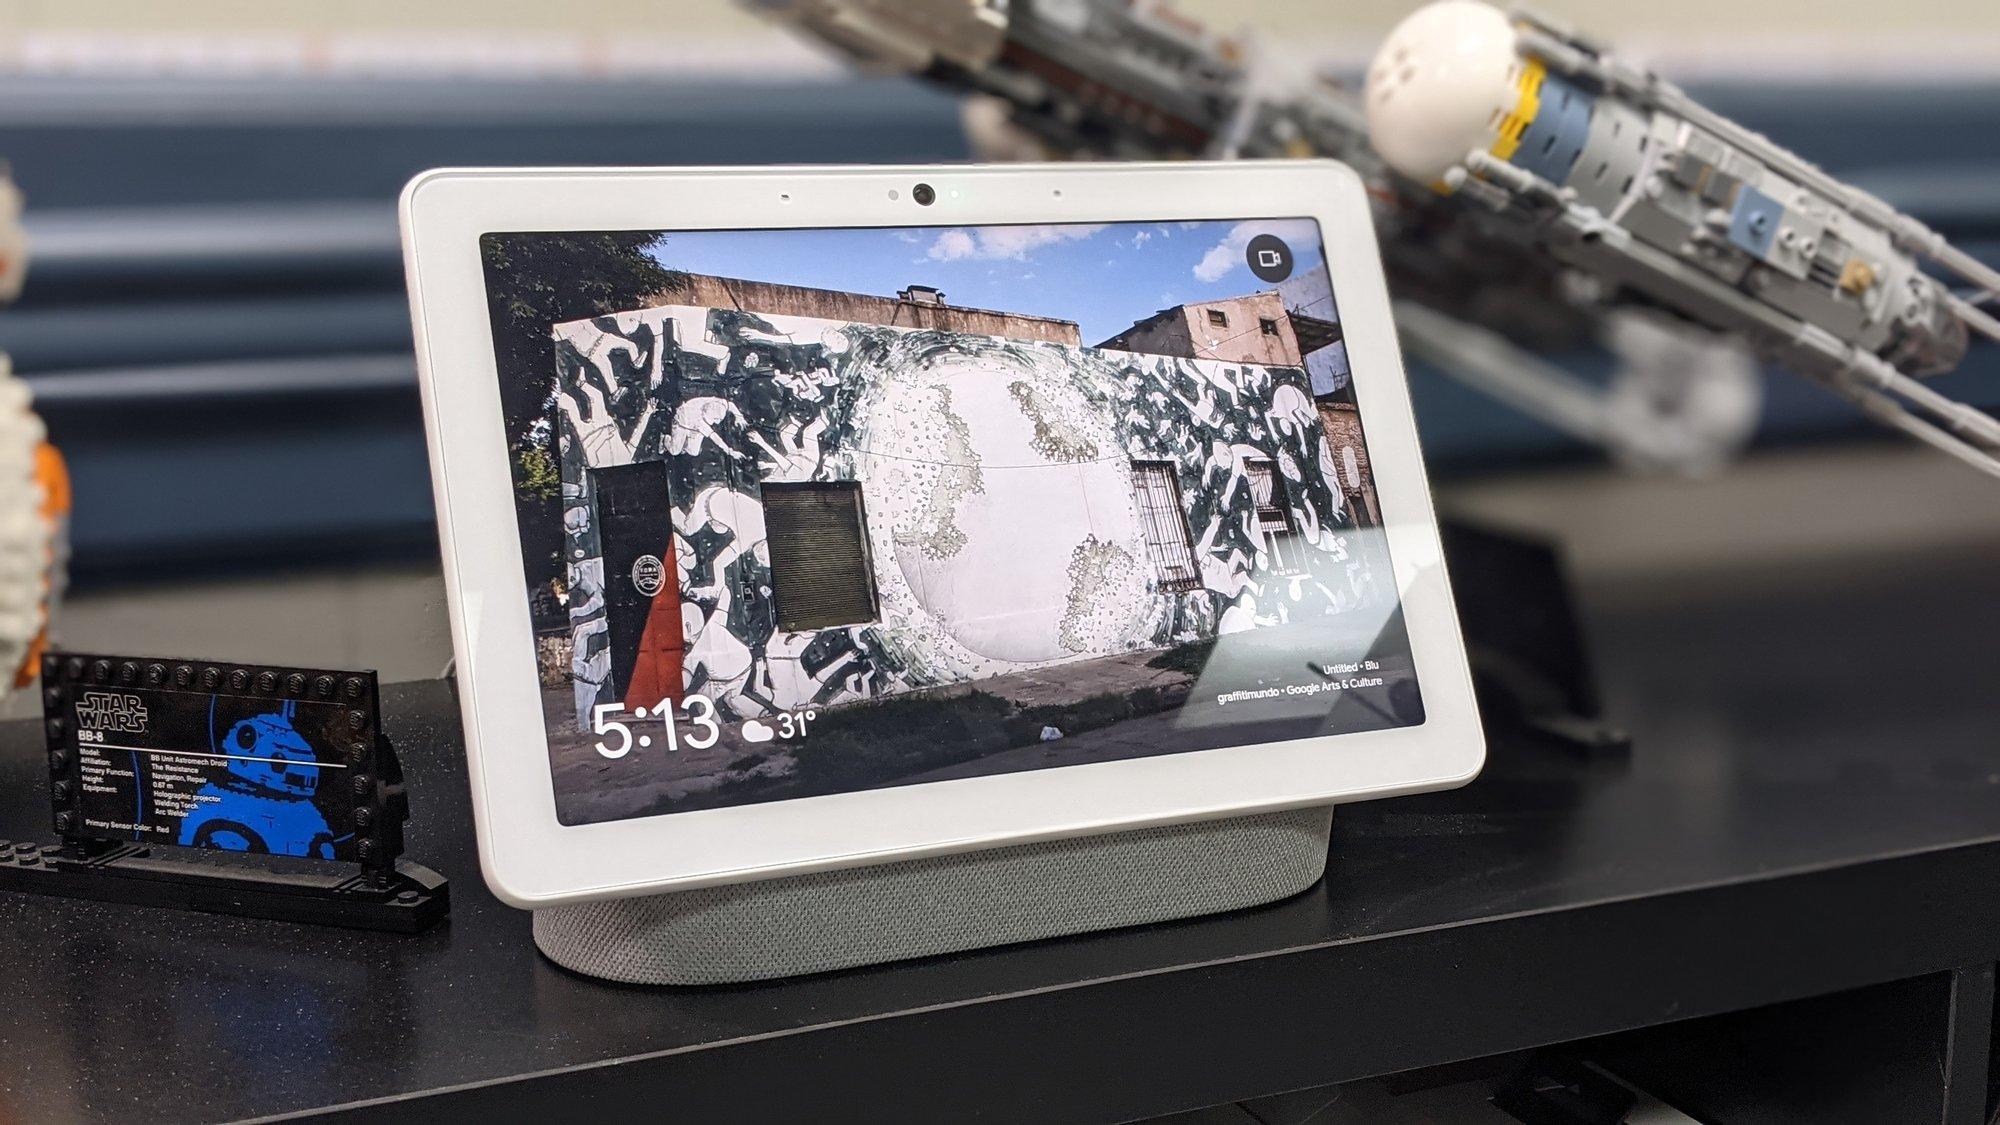 Google Home Max smart speaker production ended